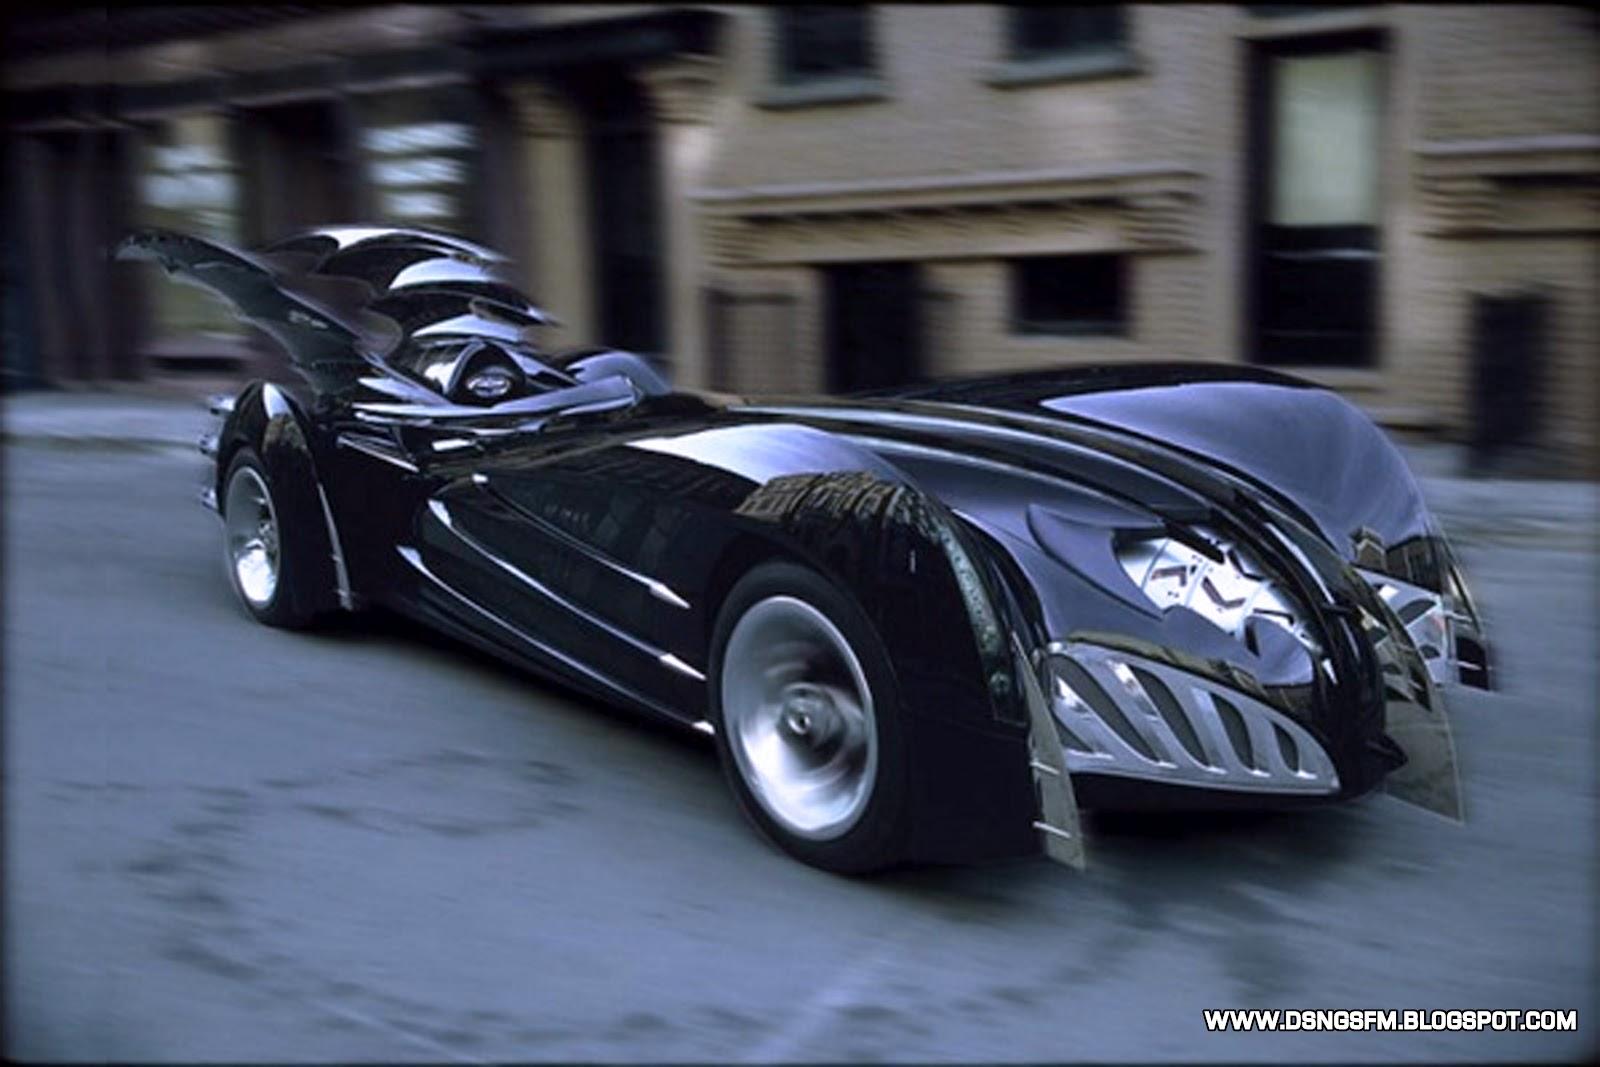 Jim Click Nissan >> DSNG'S SCI FI MEGAVERSE: REAL-LIFE NISSAN BATMOBILE, PLUS OTHER BATMOBILE VERSIONS